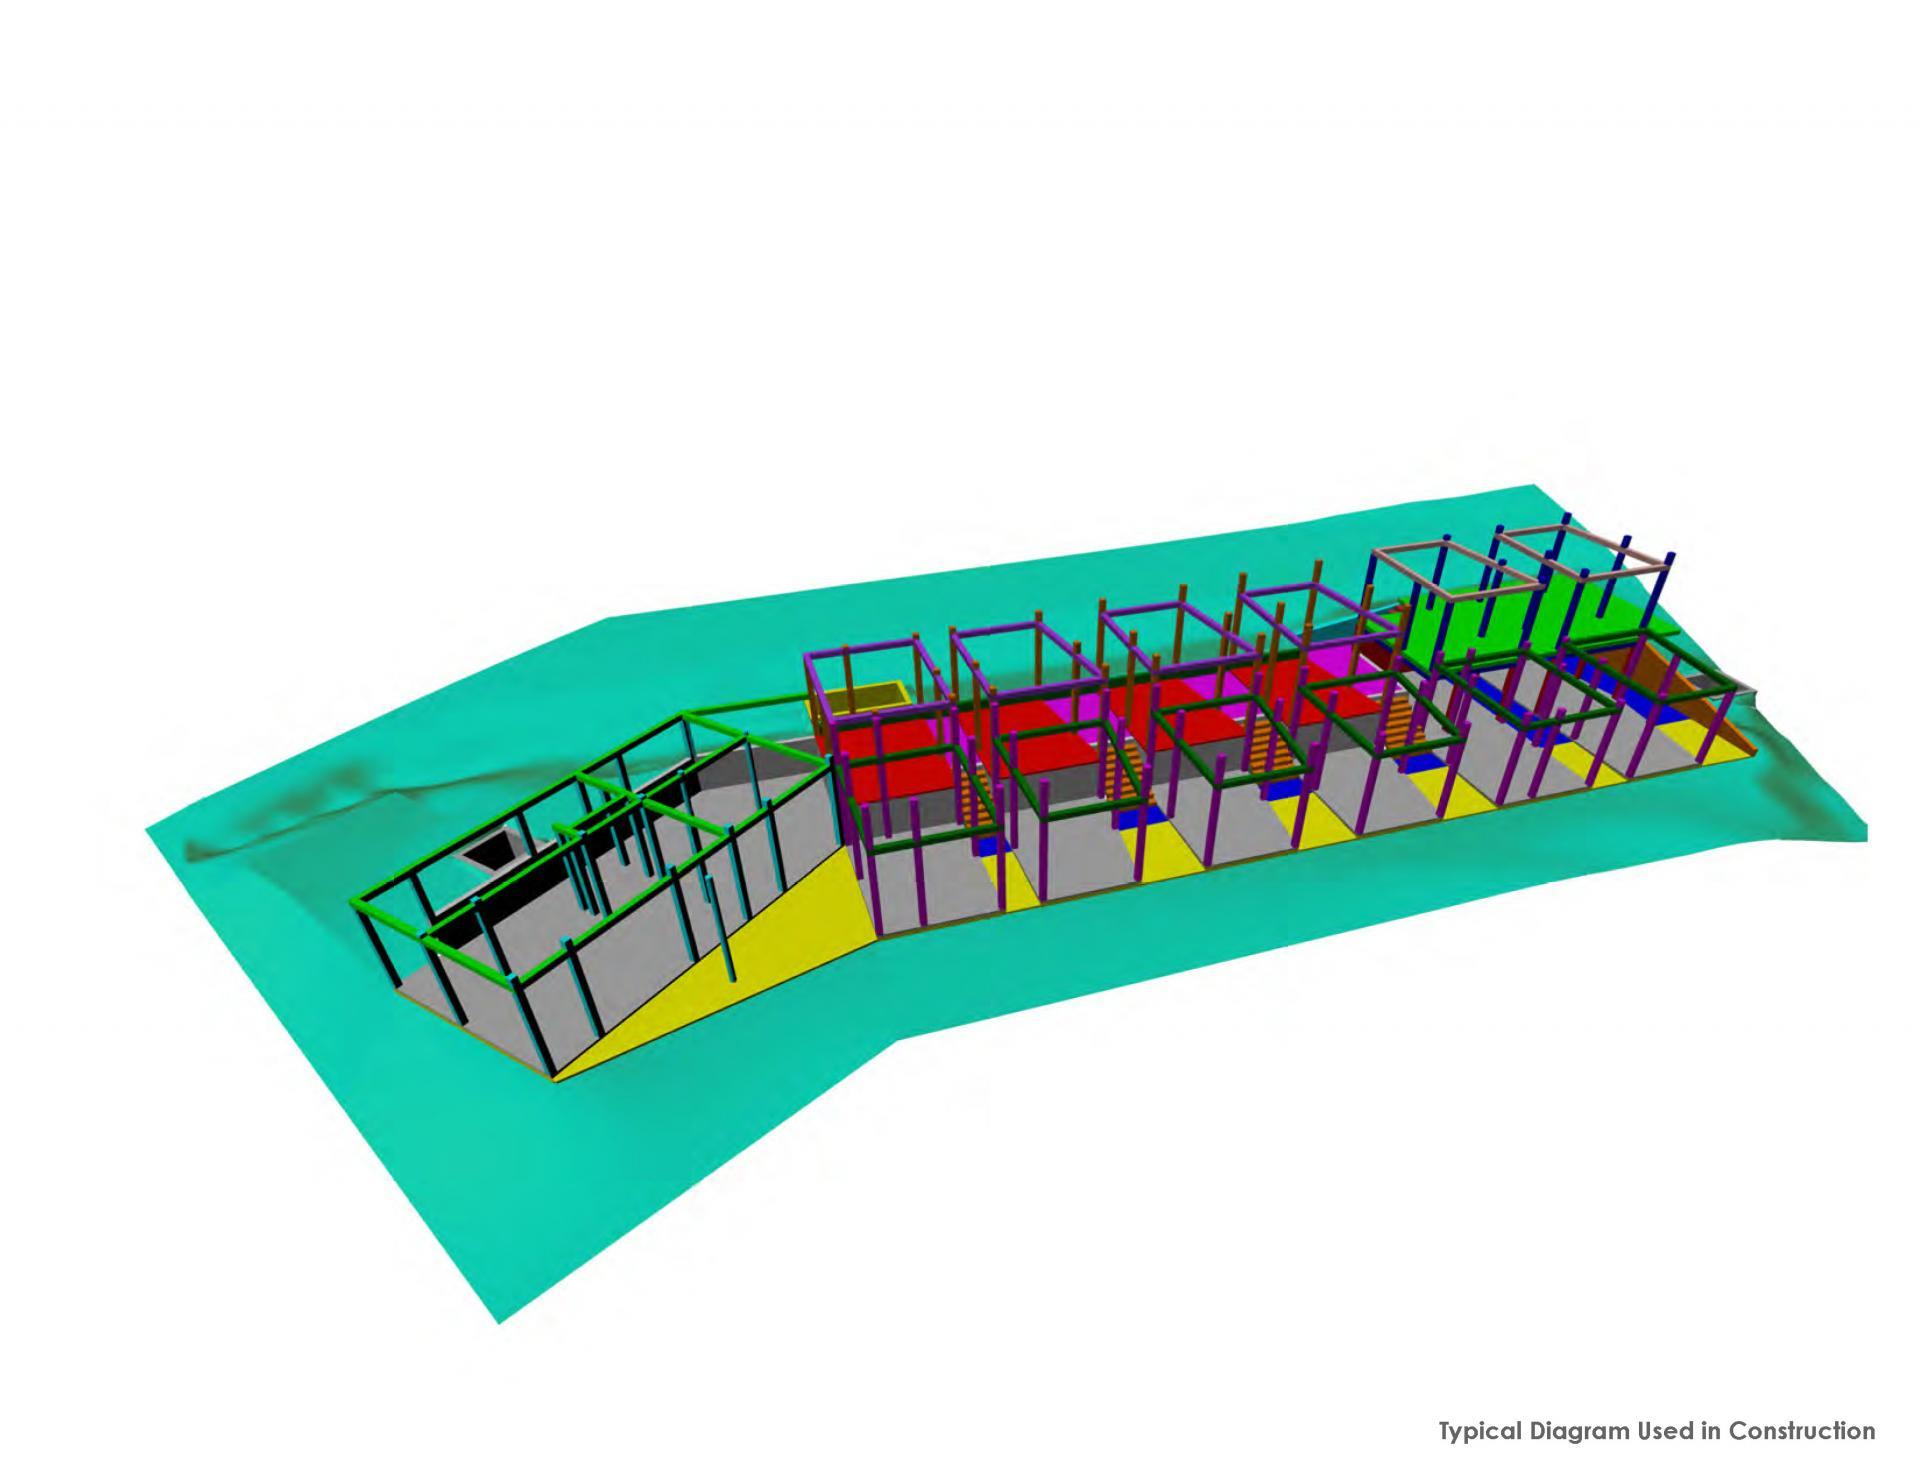 VHW_Staff_Housing5Construction_Diagram_0